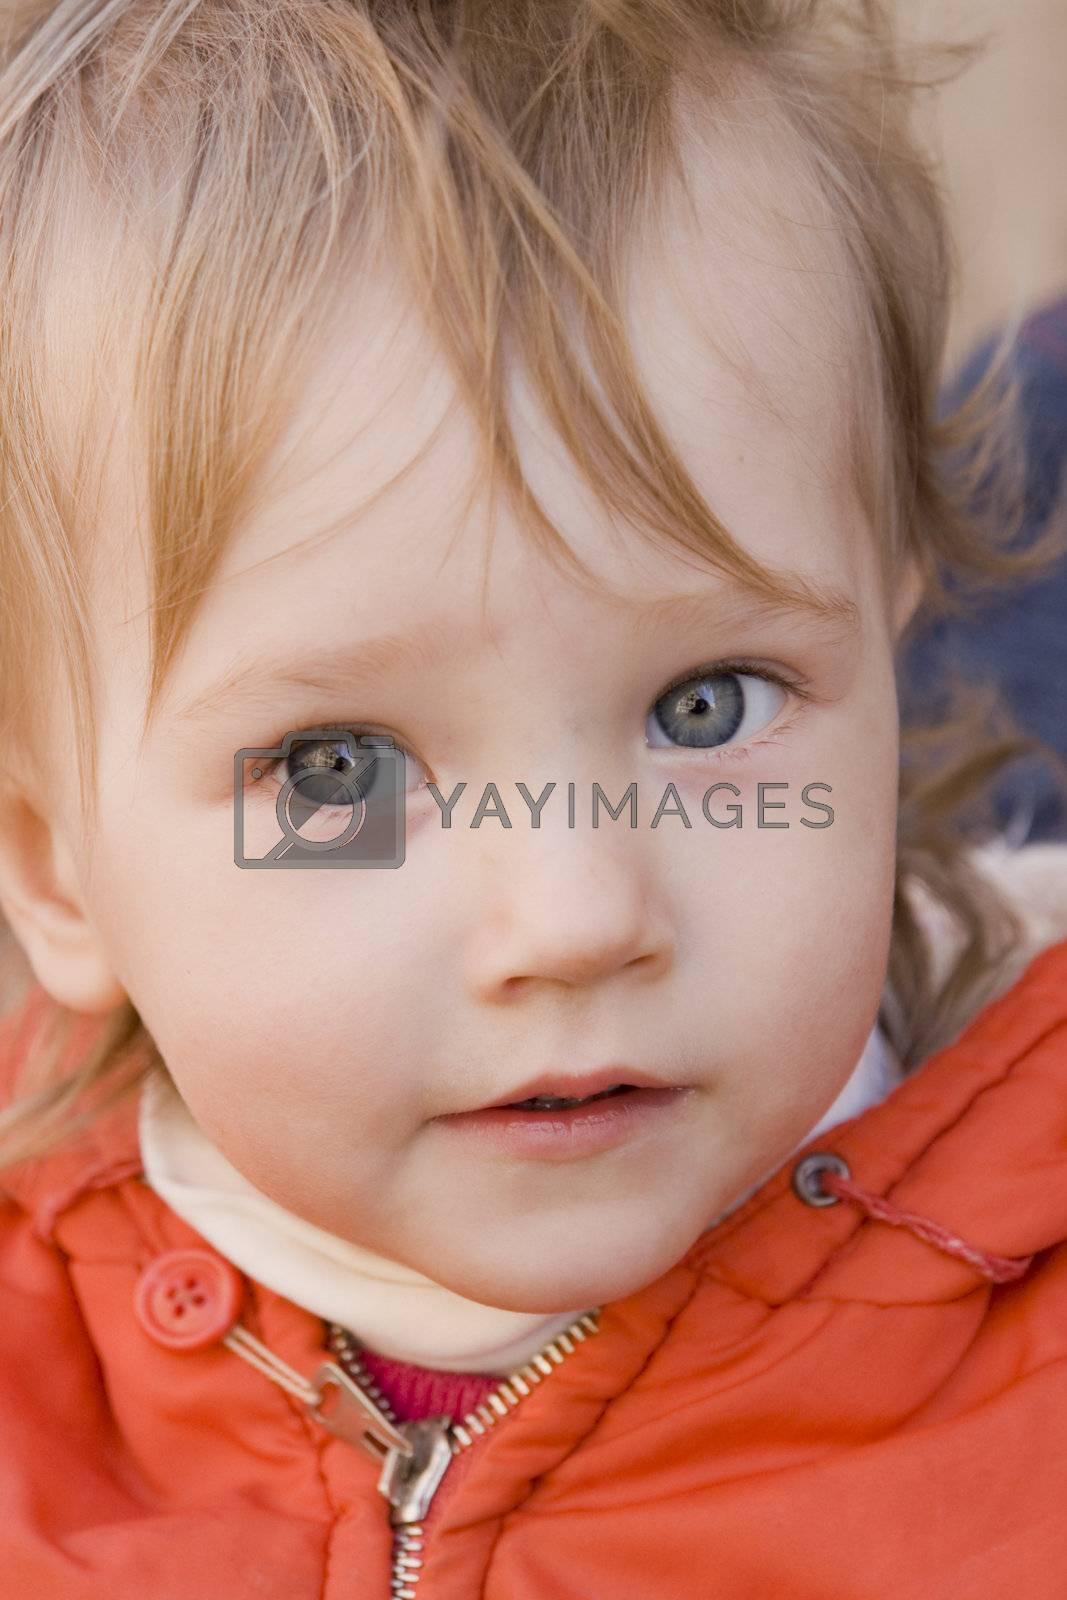 little girl wiyh curious eyes in orange dress